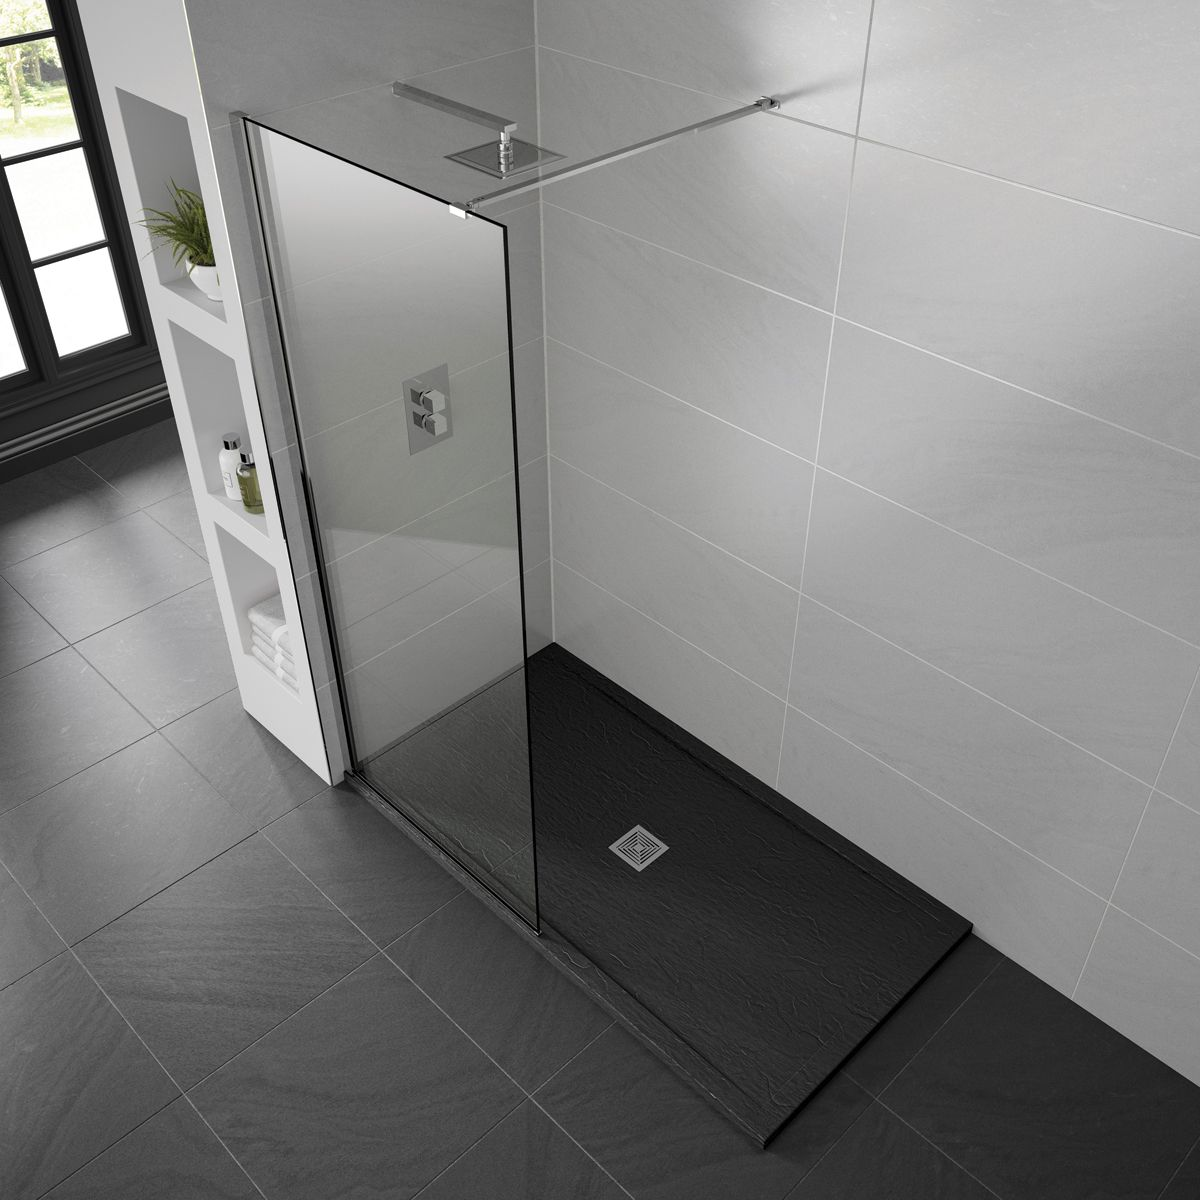 Aquadart Black Slate Shower Tray 1200 x 900 Lifestyle